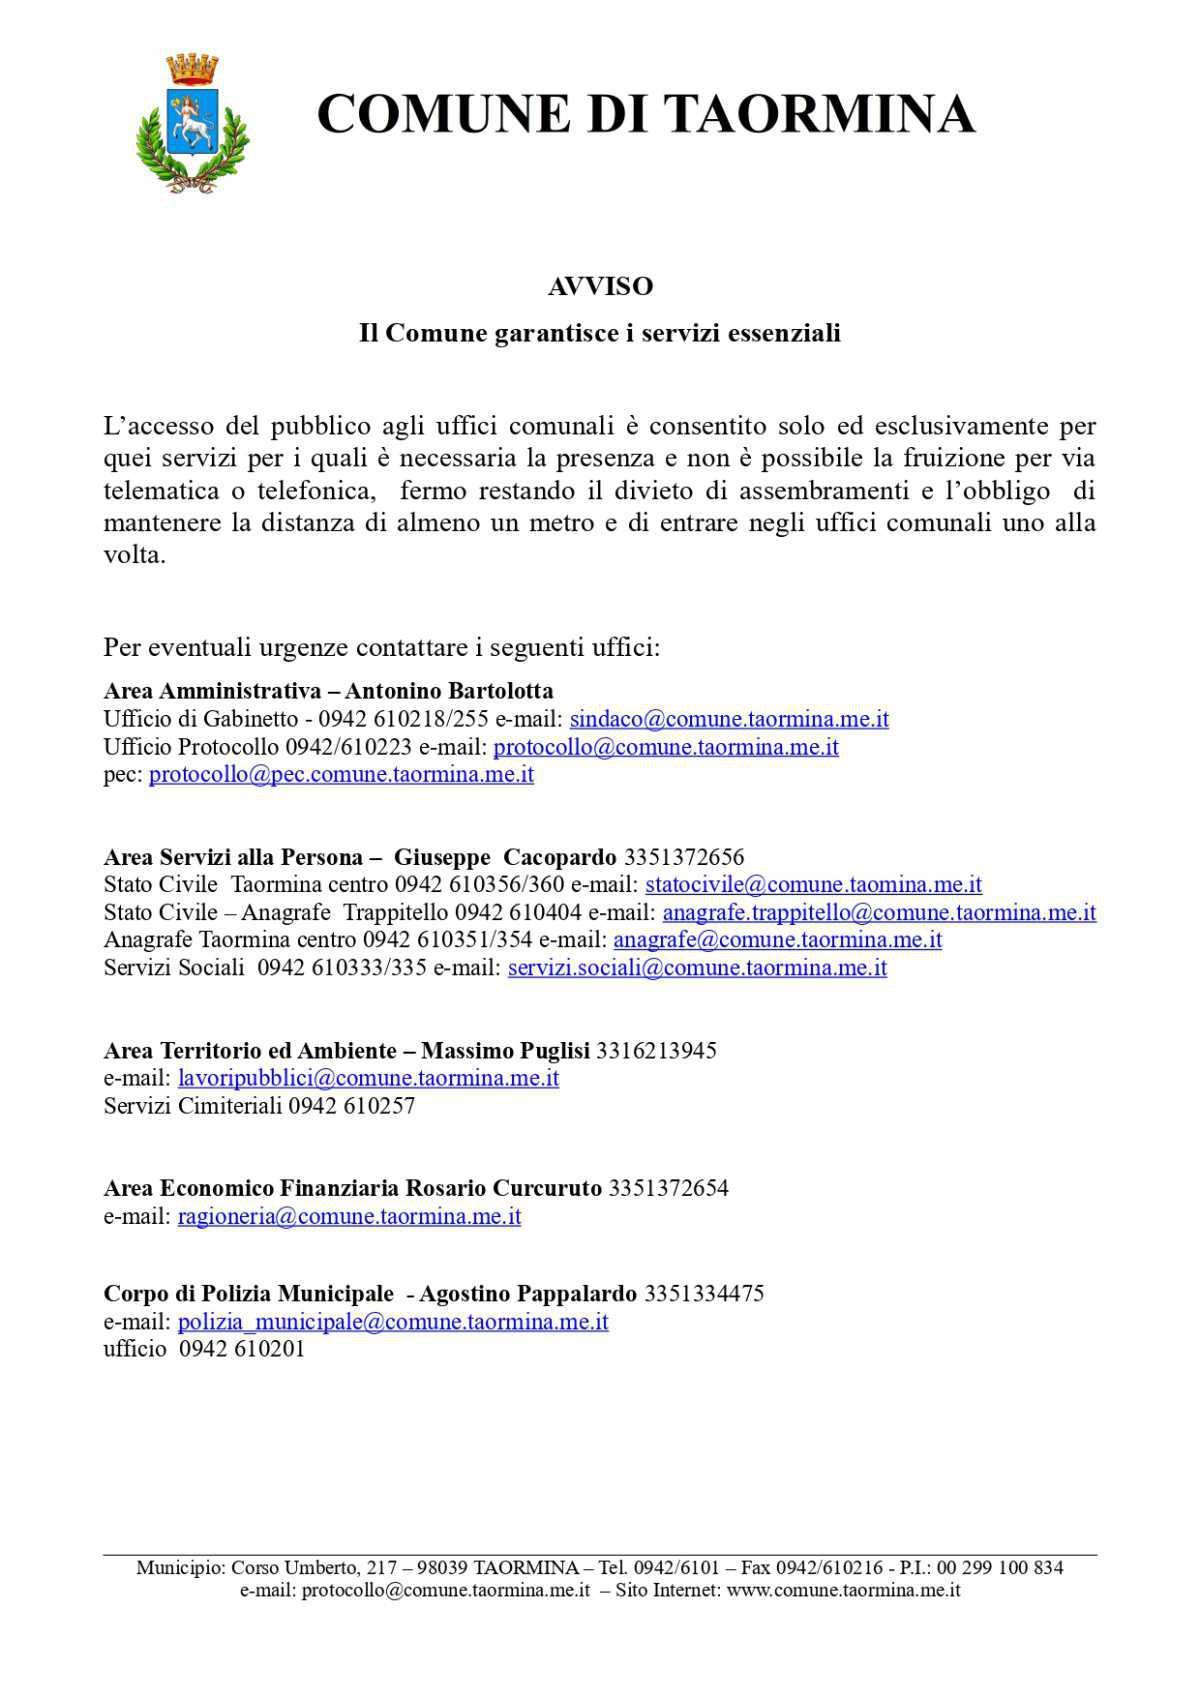 AVVISO - Il Comune garantisce i servizi essenziali